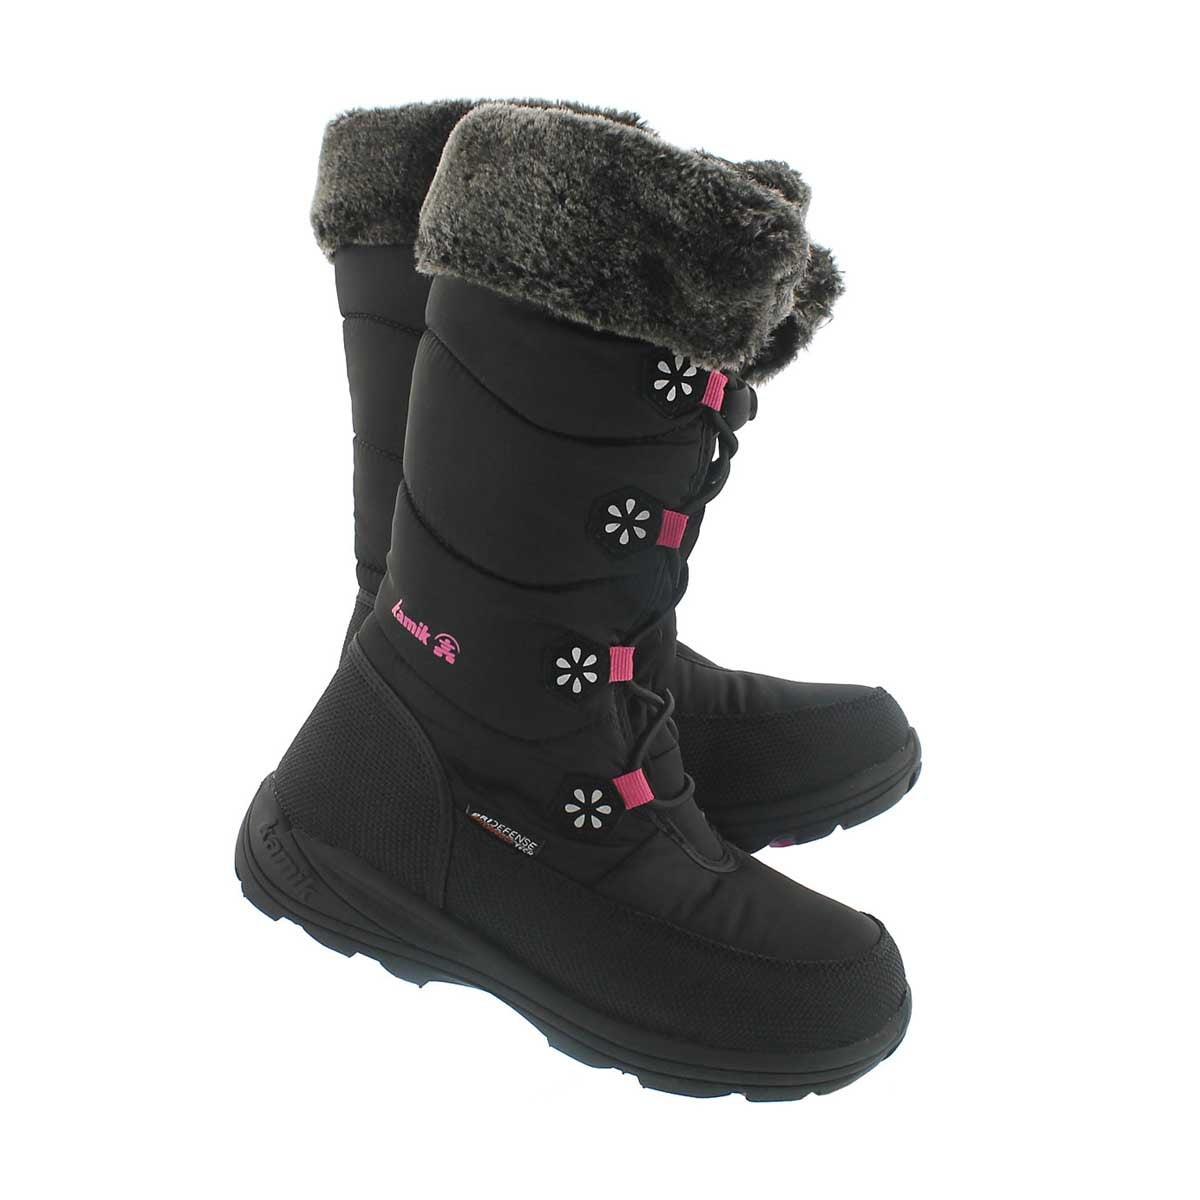 Grls Ava black tall bungee winter boot